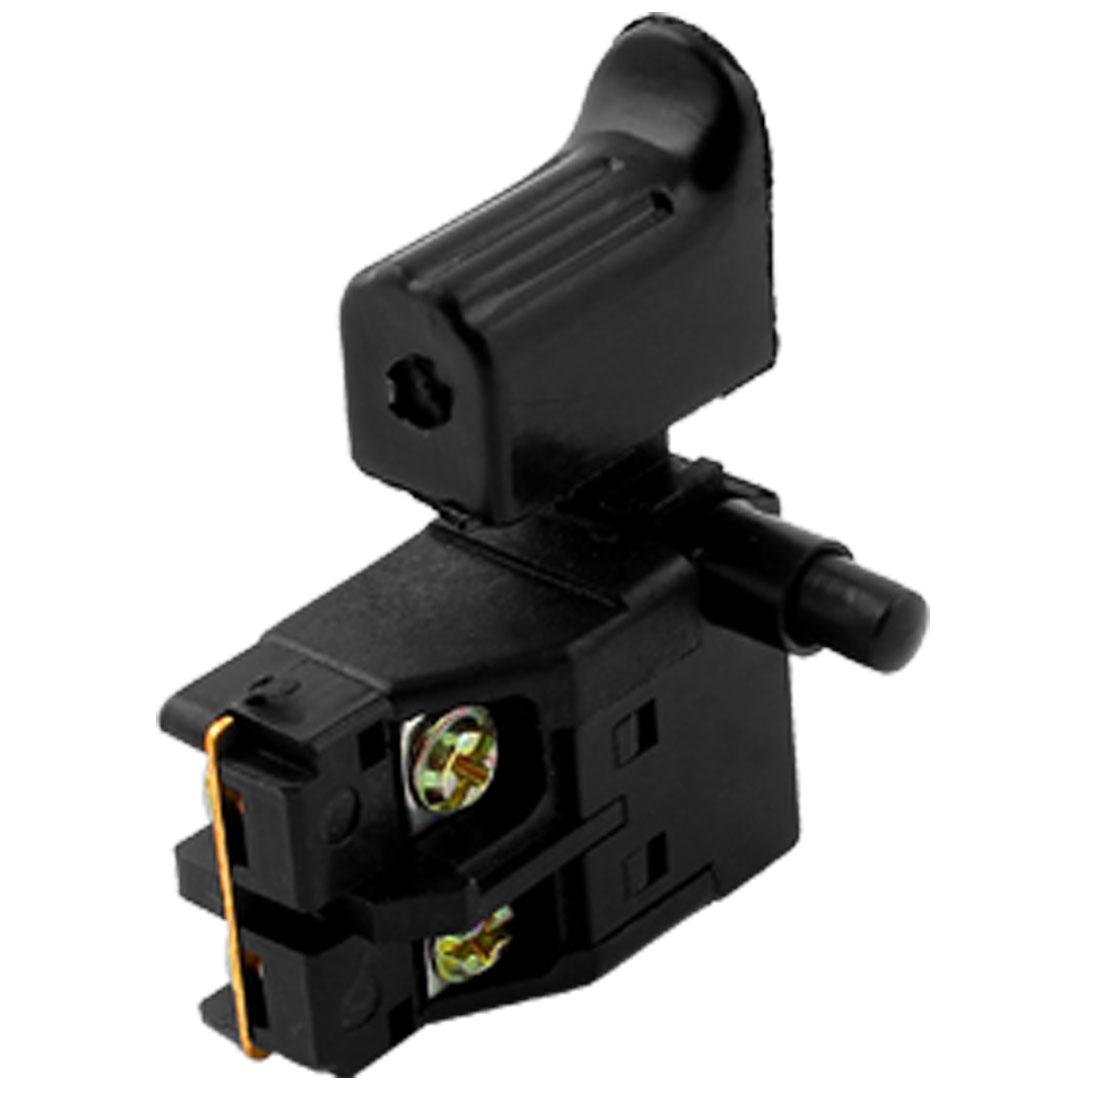 FA2-6/1B 250V 6A 5E4 Power Tool Electric Hand Drill Trigger Switch Black